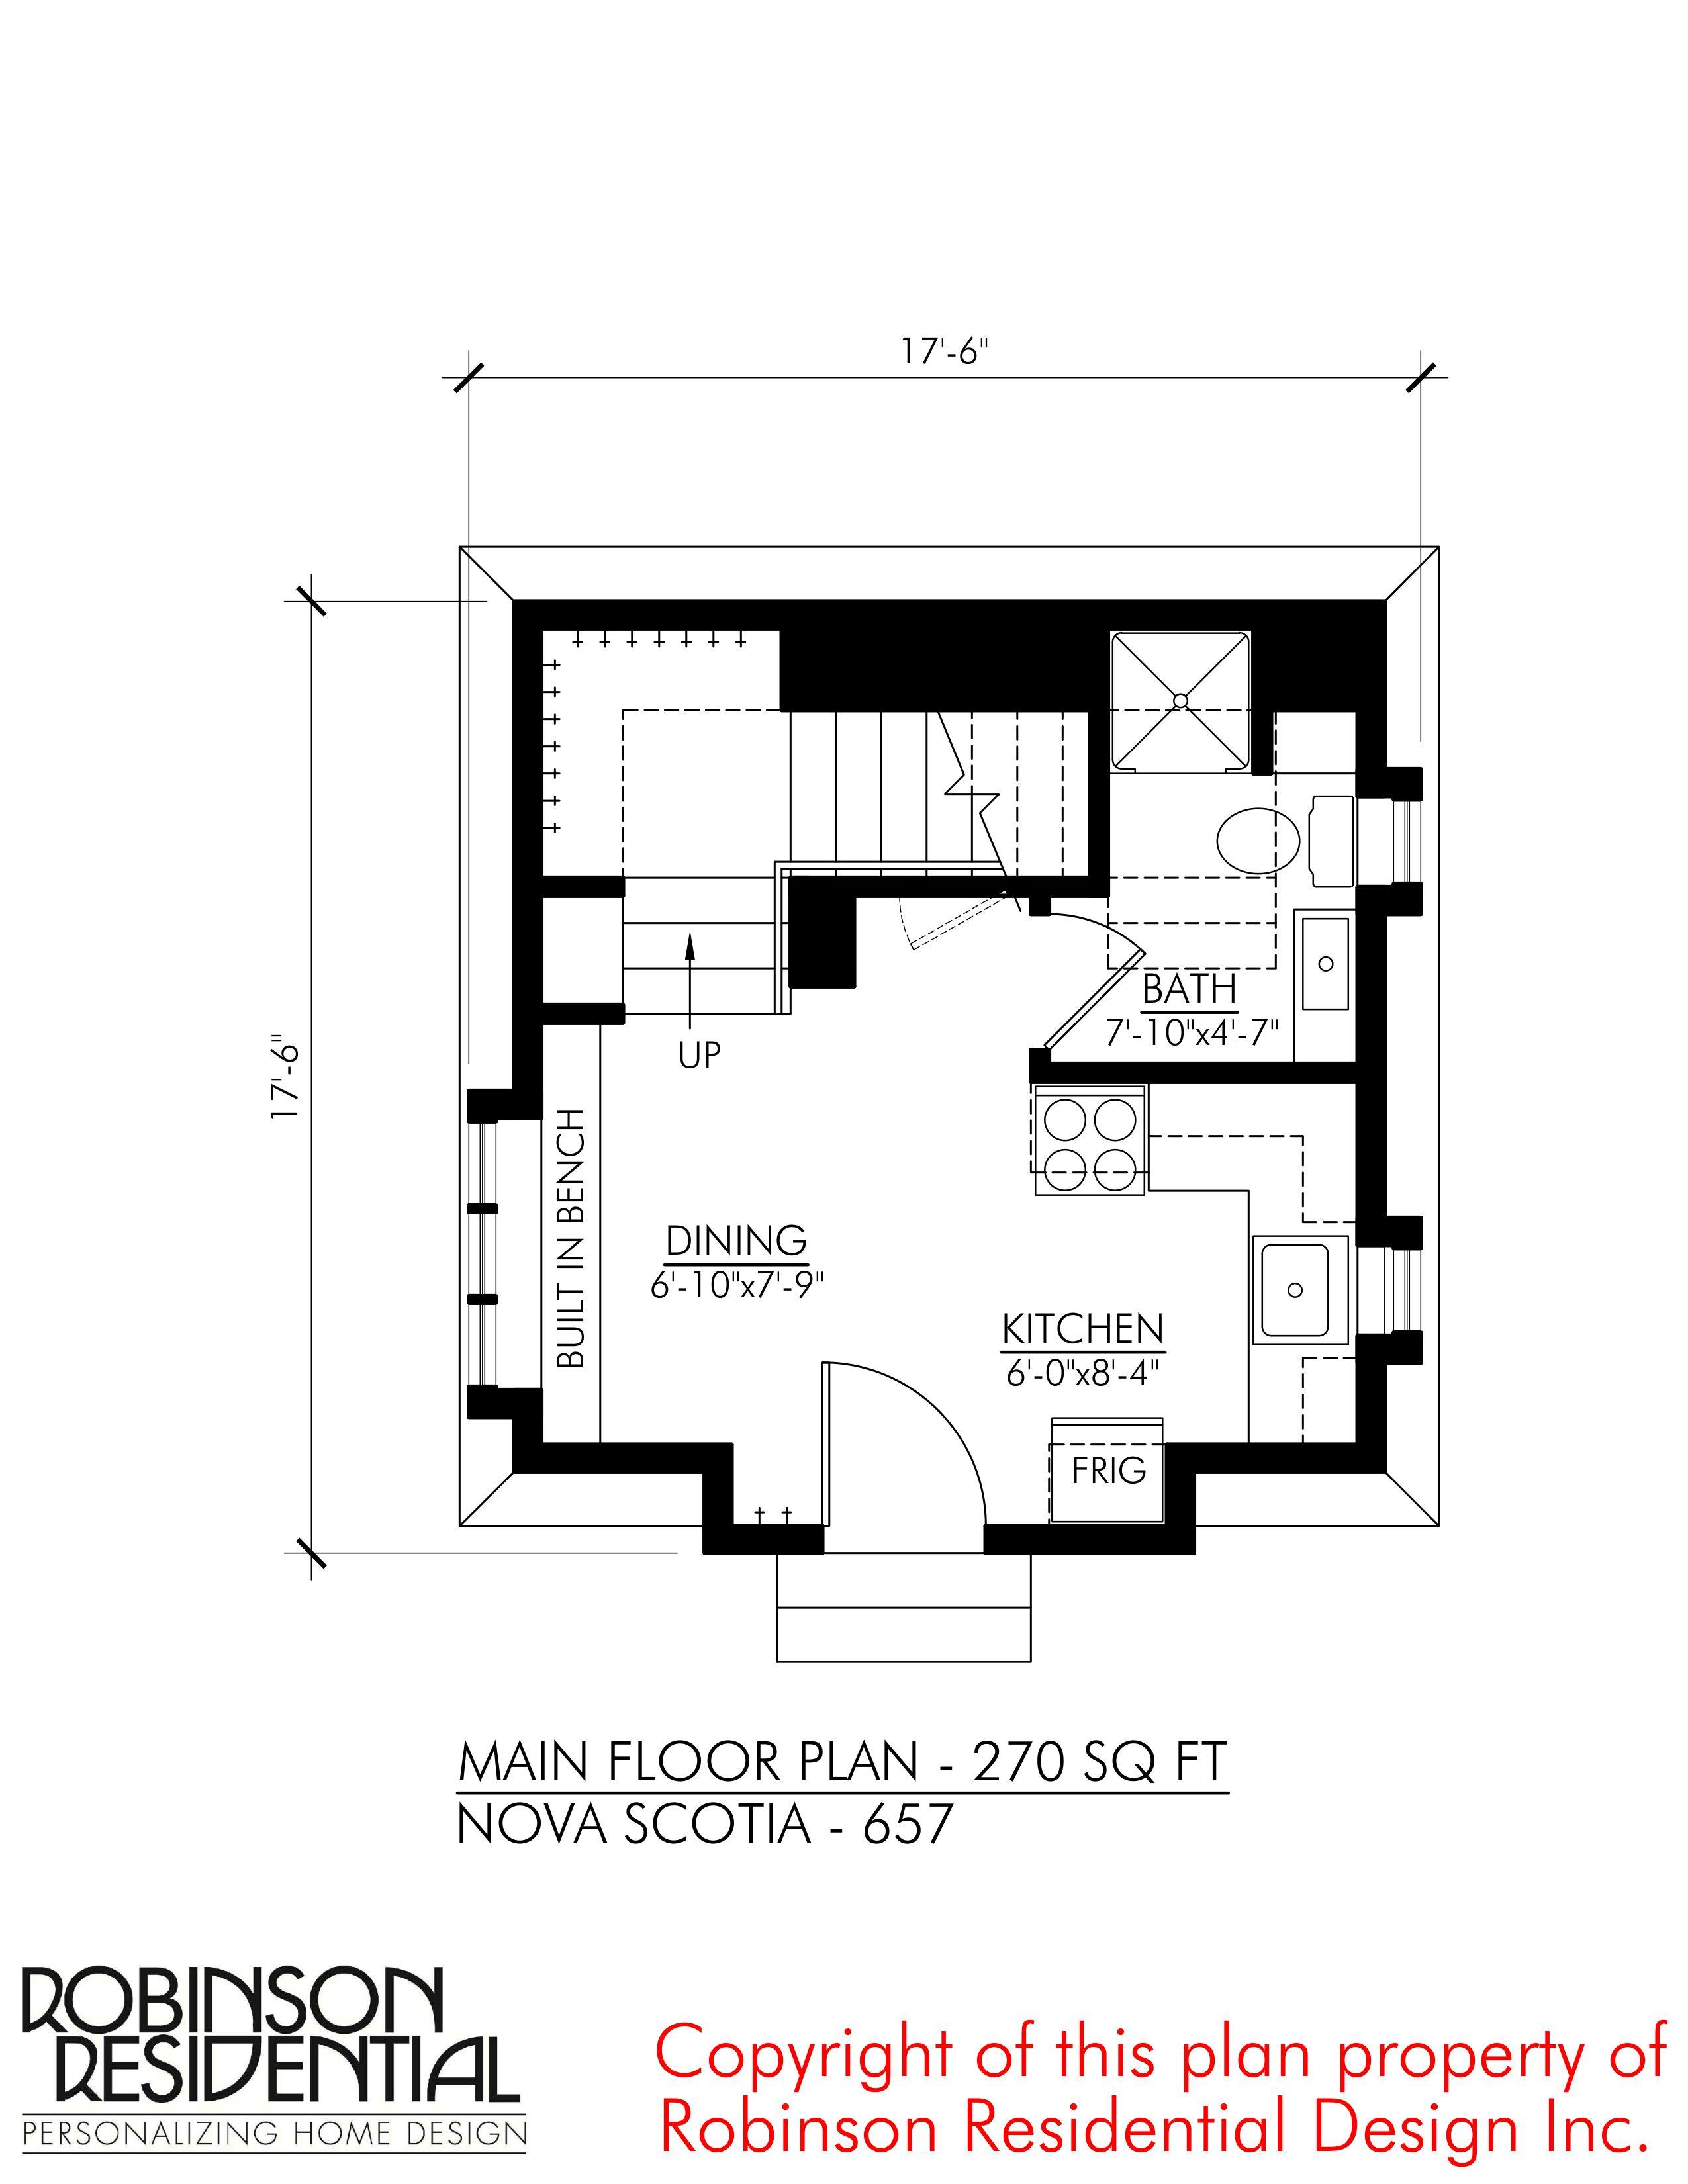 Nova Scotia 657 Robinson Plans In 2020 Small House Plans House Plans Bathroom Floor Plans